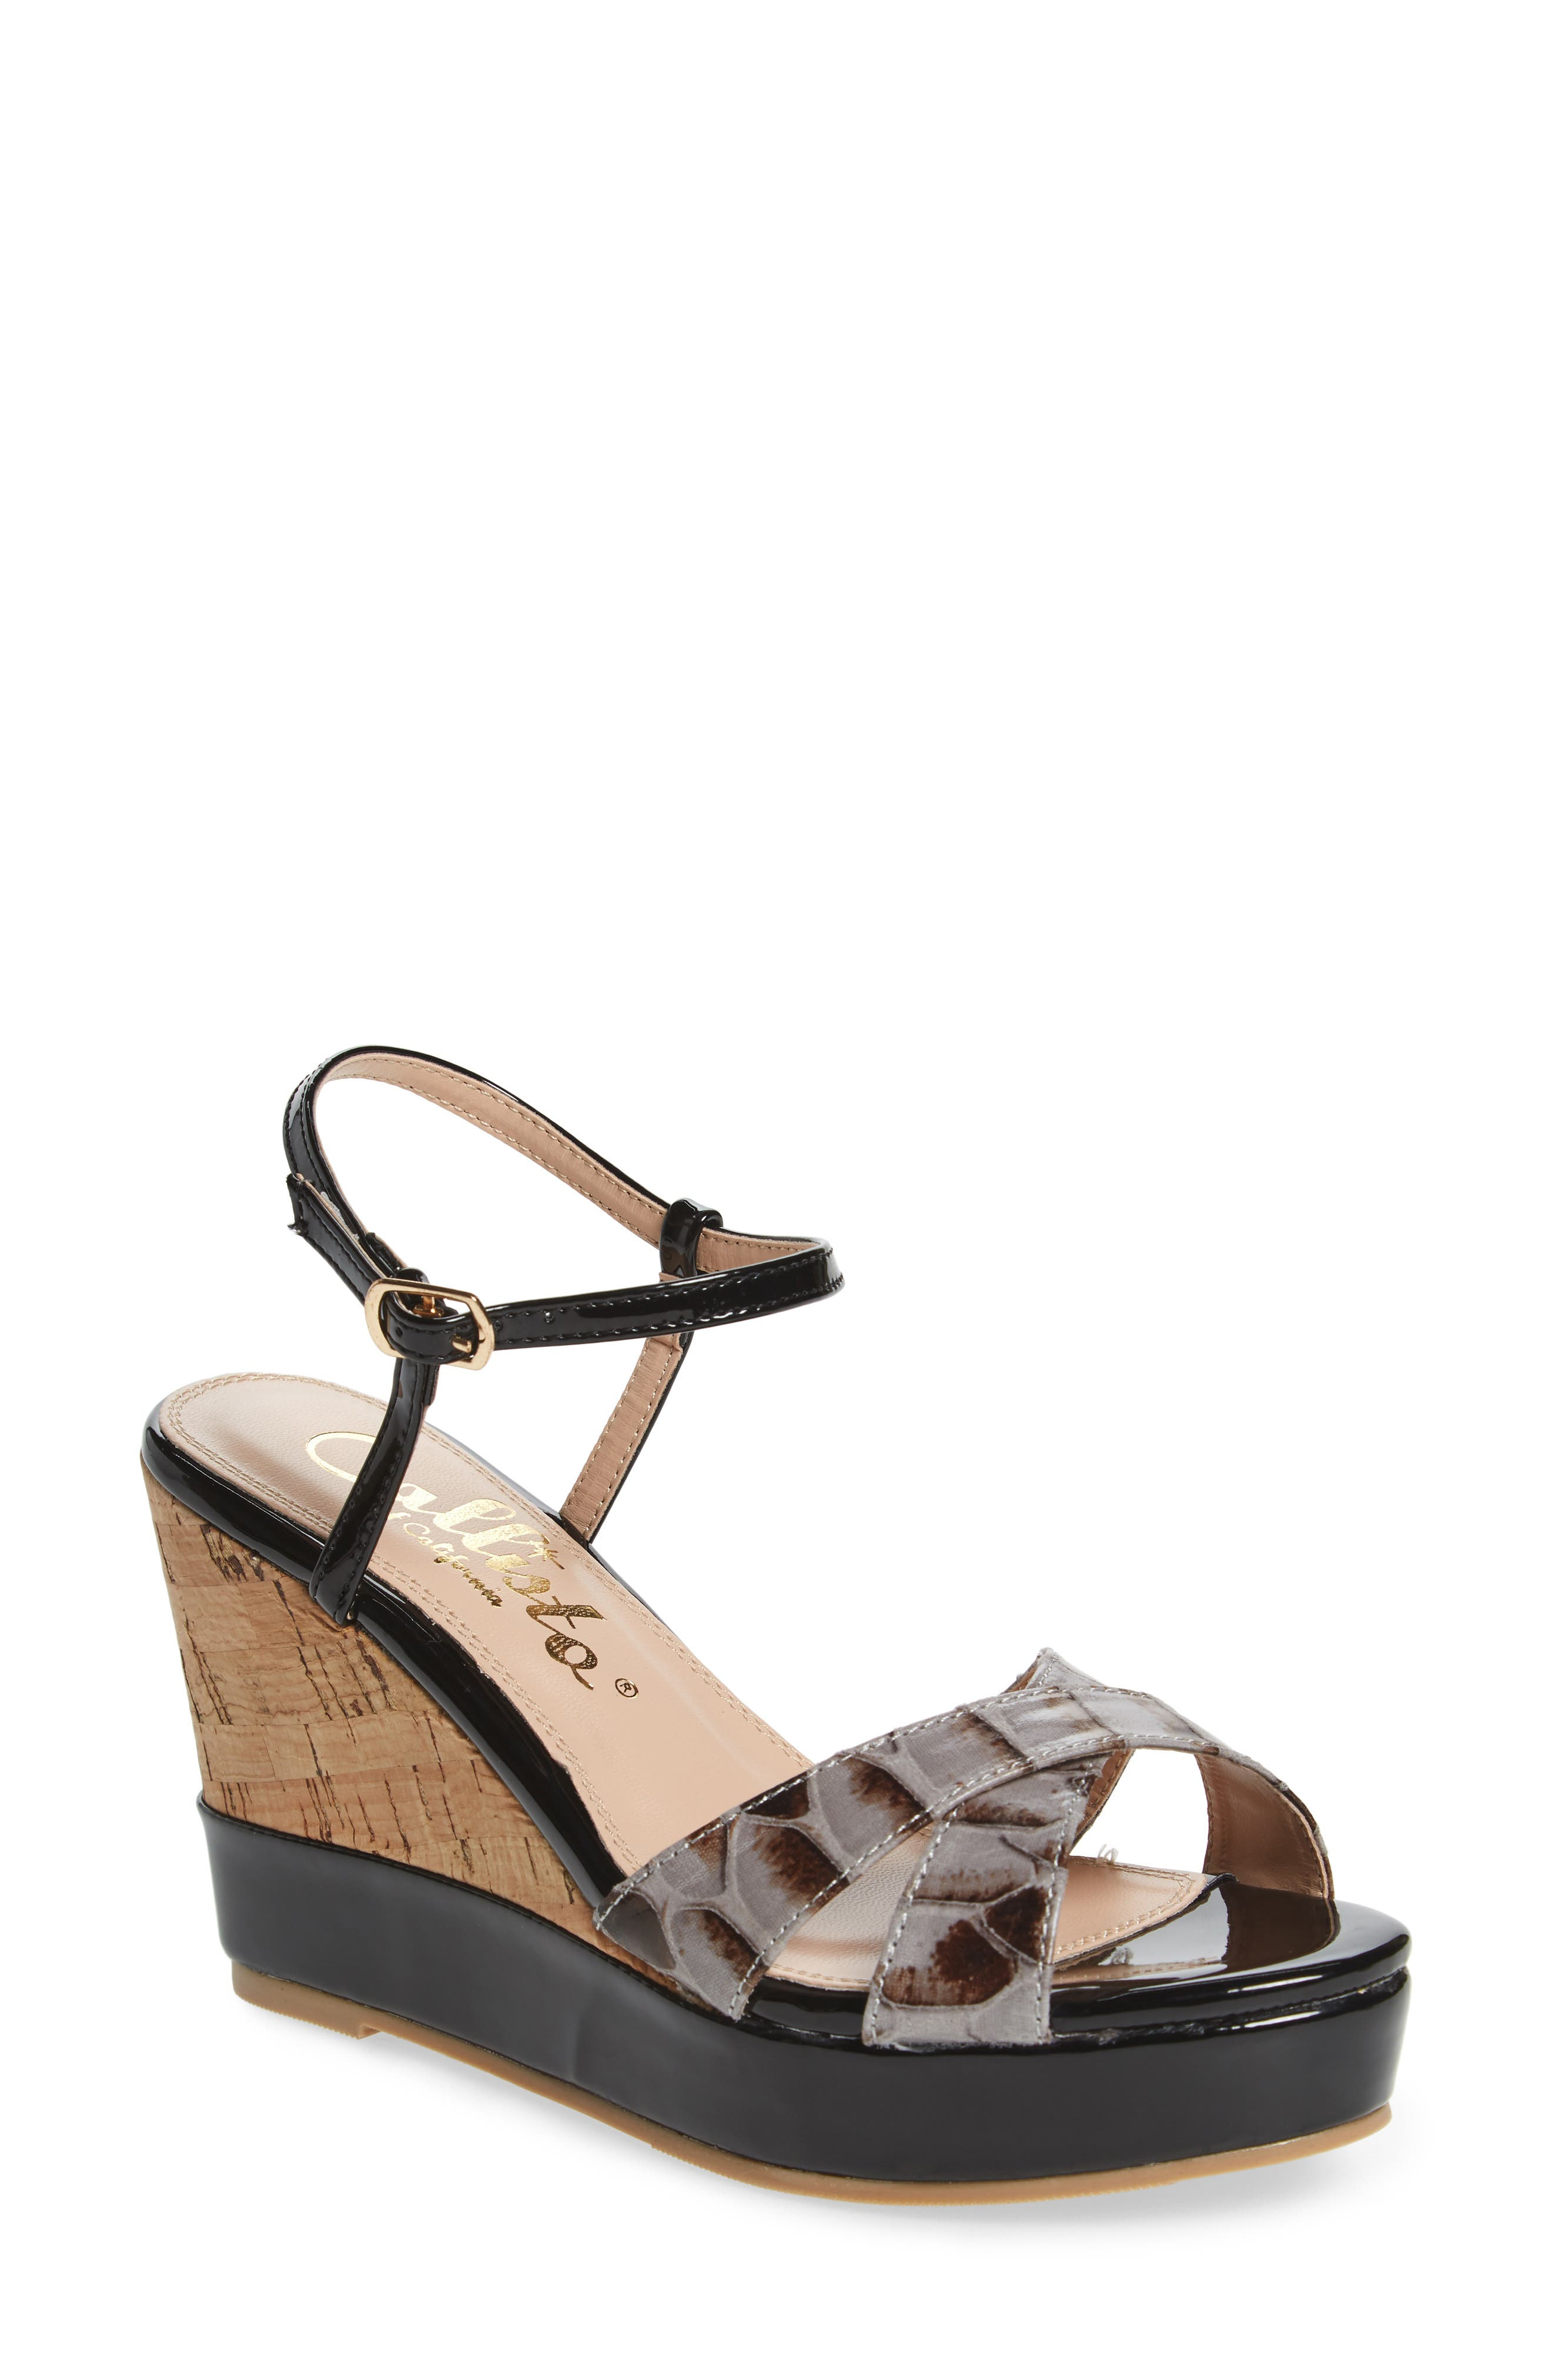 Alternate Image 1 Selected - Callisto Lottie Platform Wedge Sandal (Women)